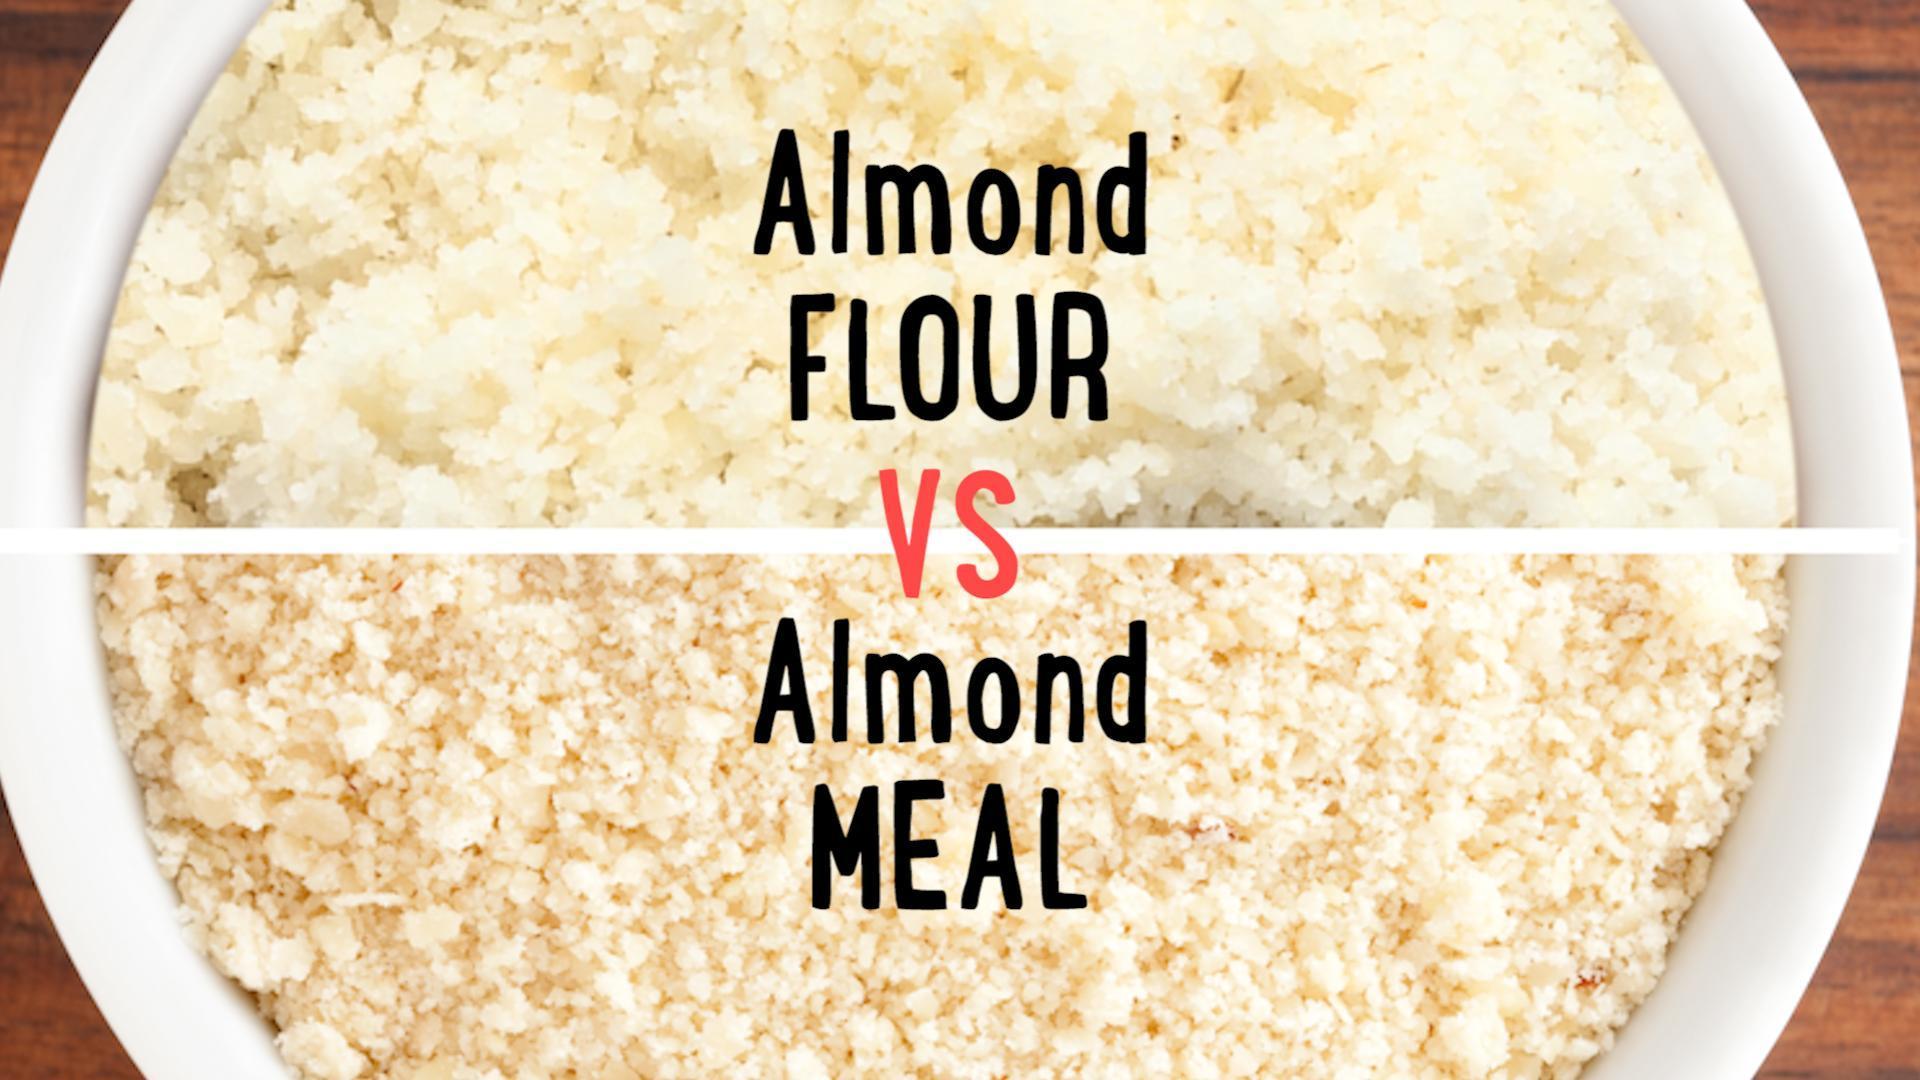 Almond Meal vs. Almond Flour